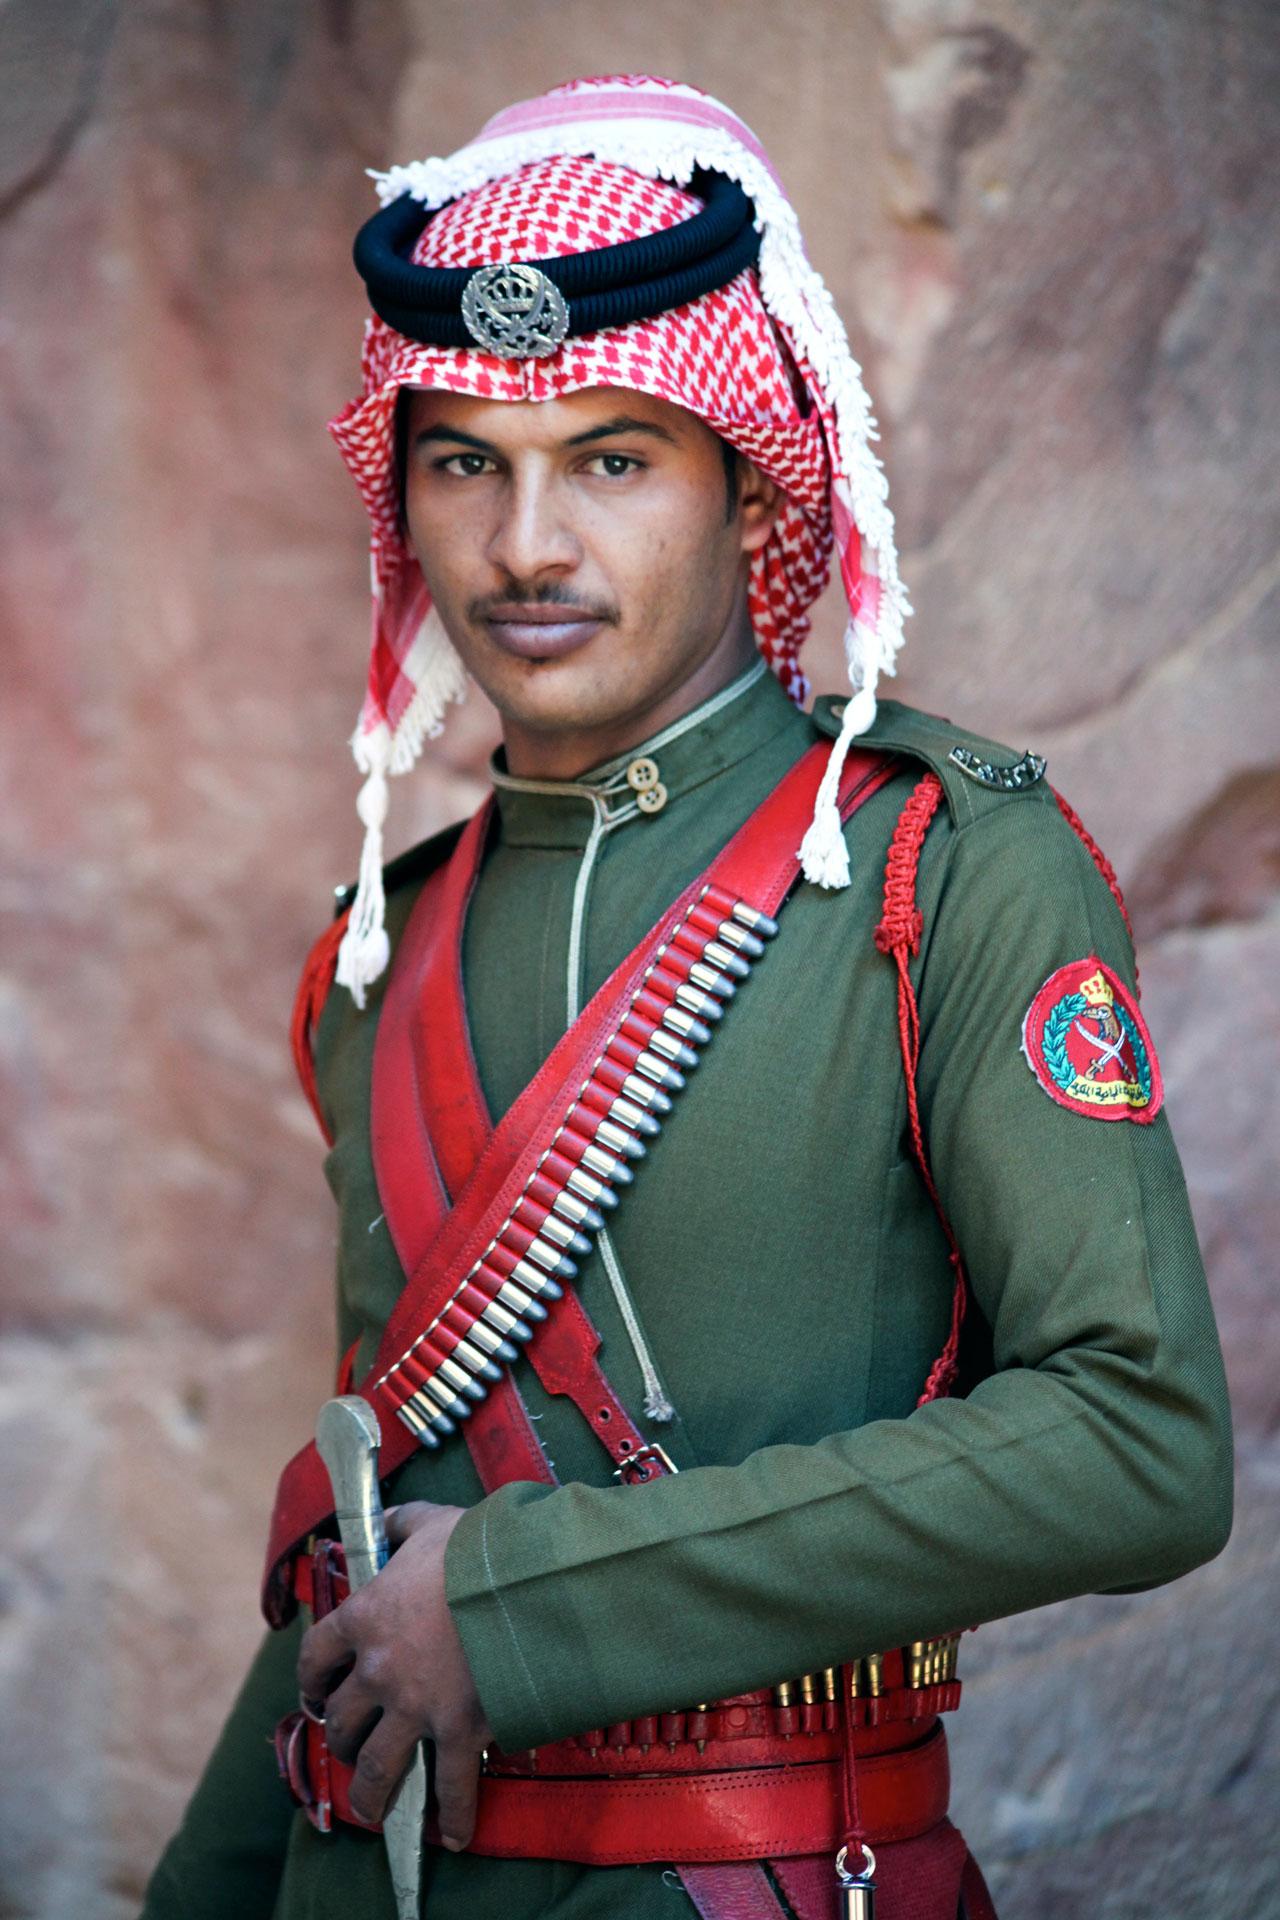 guardia-zona-arquelogica-petra-jordania.jpg